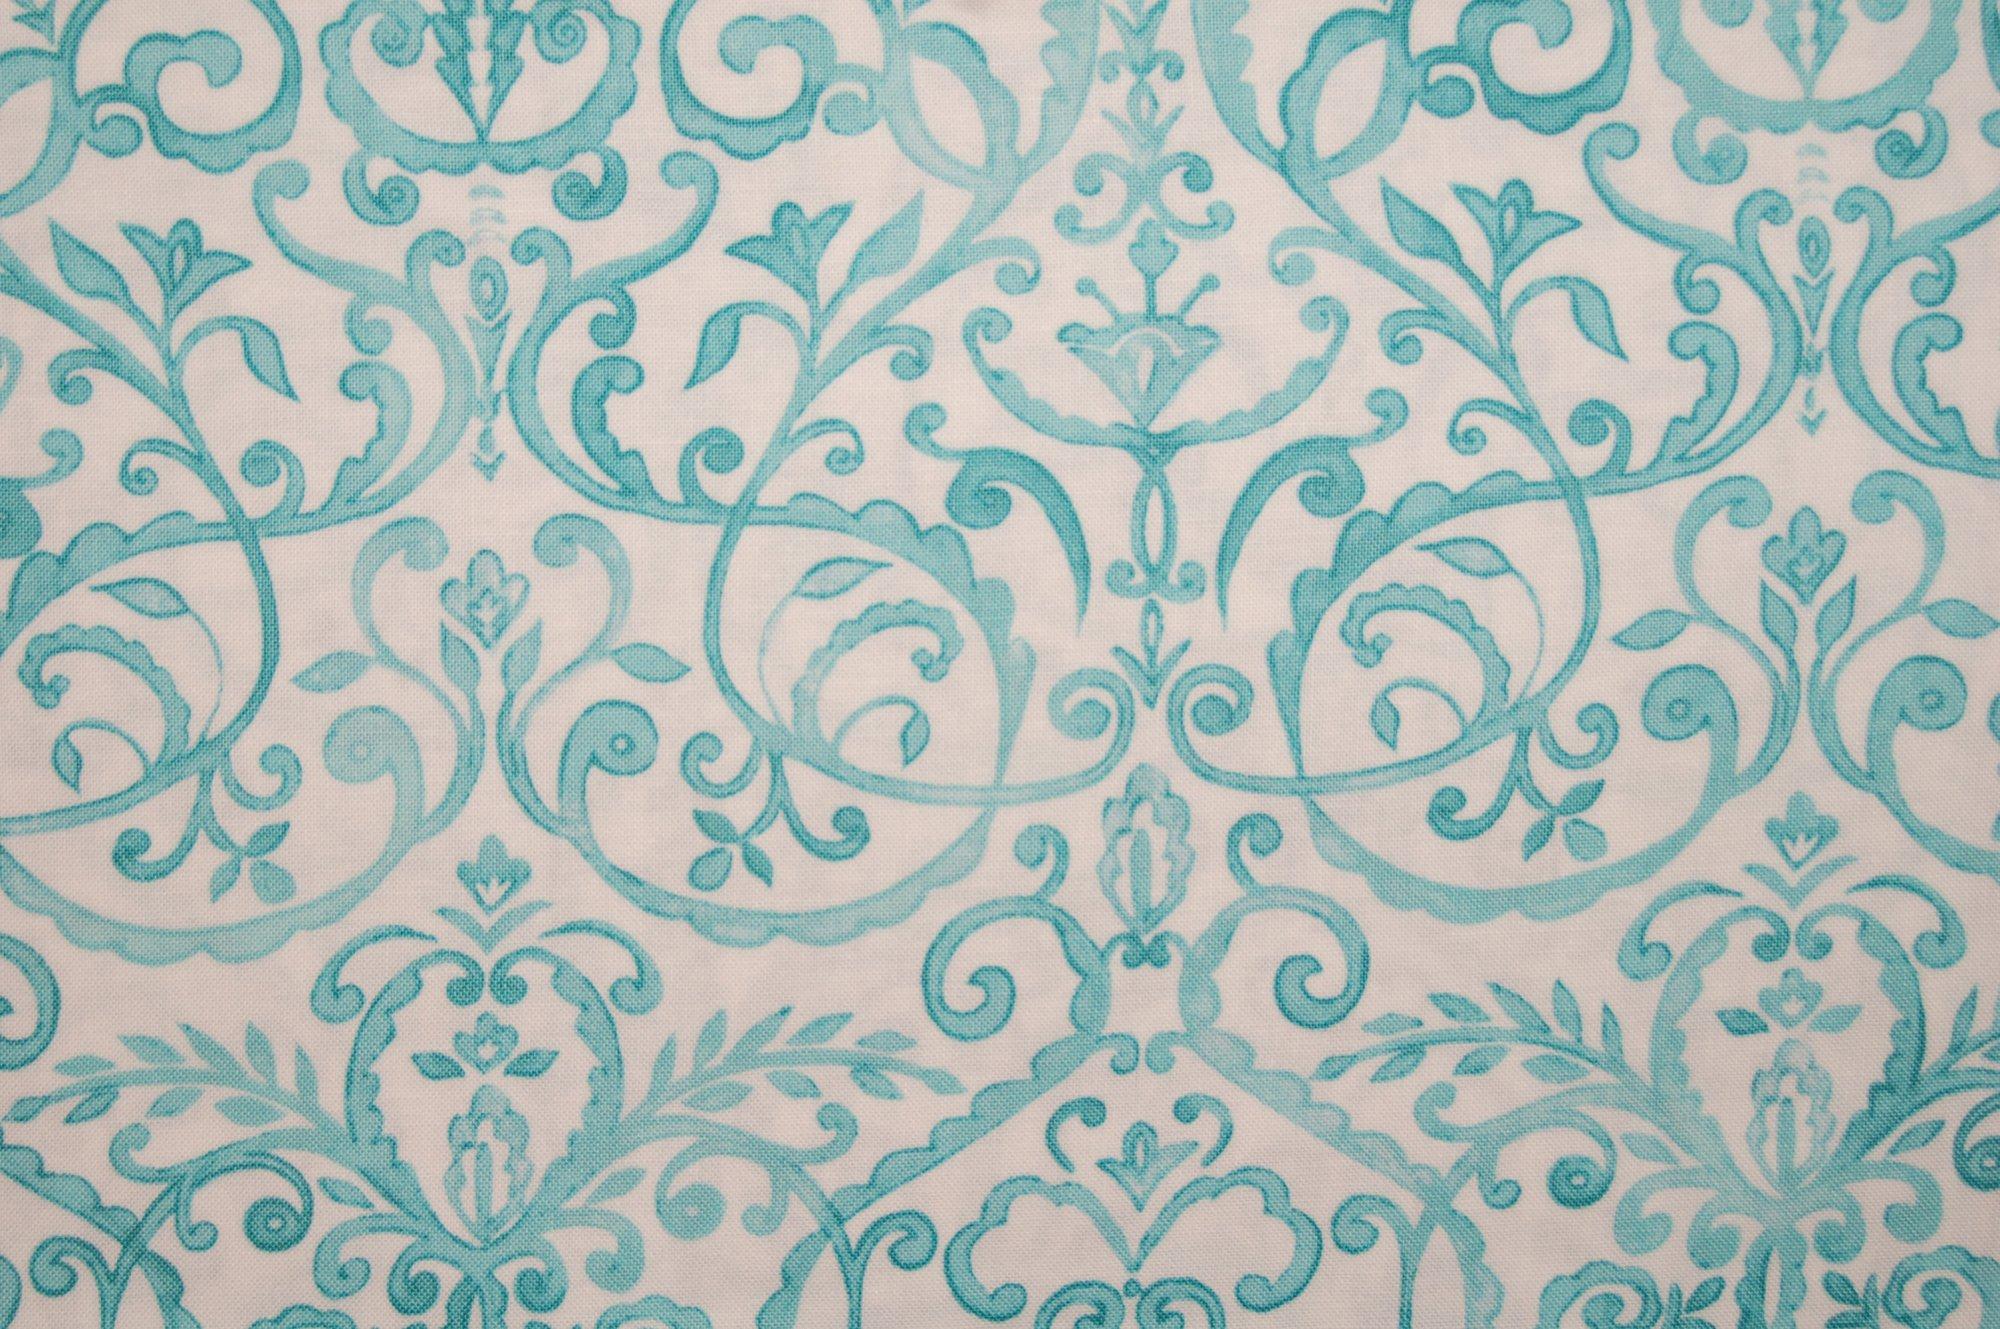 Merry Mistletoe - Scrollwork (Aqua) from Dena Designs for Free Spirit